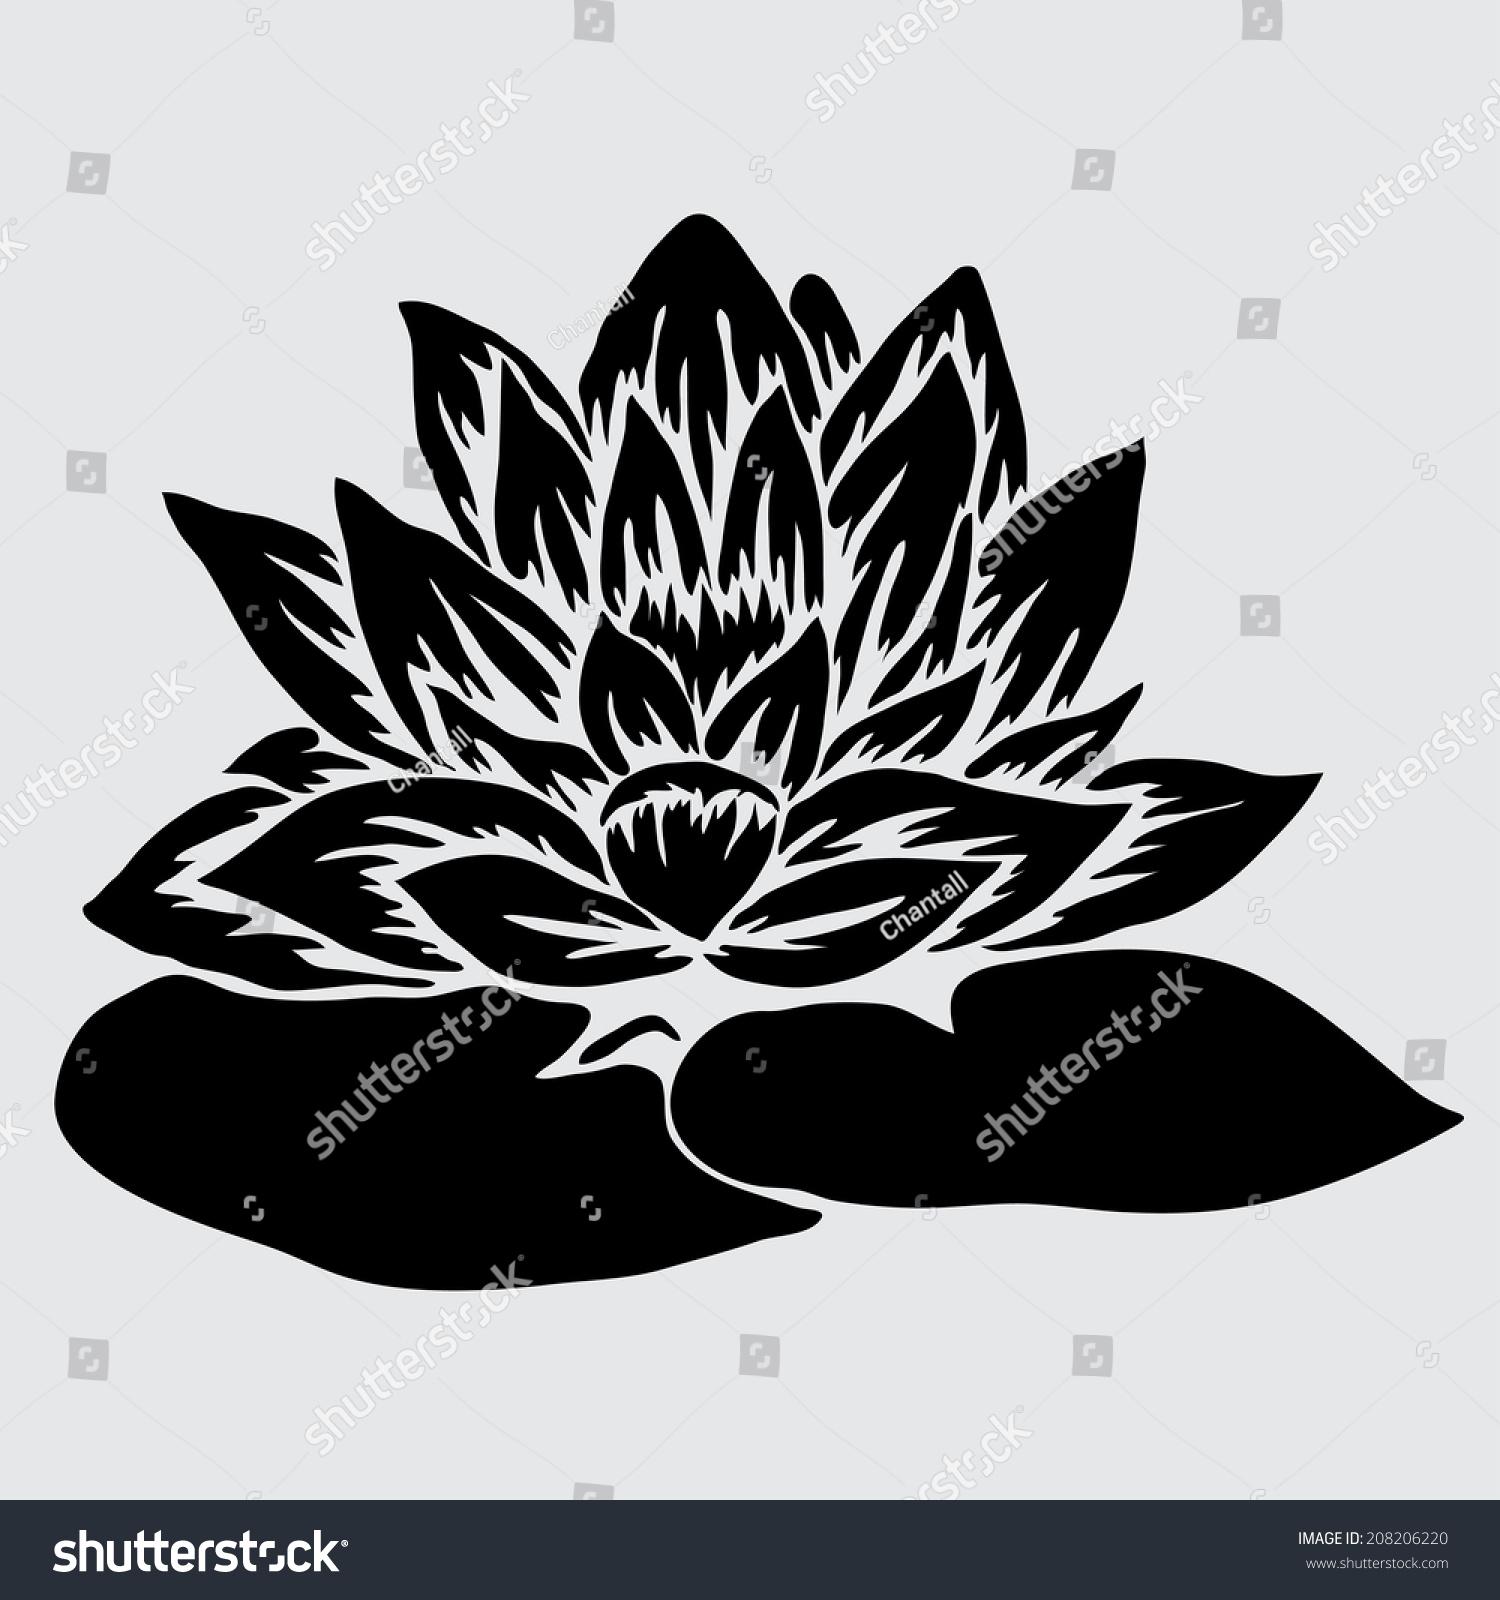 Elegant decorative lotus flower design element stock illustration elegant decorative lotus flower design element floral branch floral decoration for vintage wedding izmirmasajfo